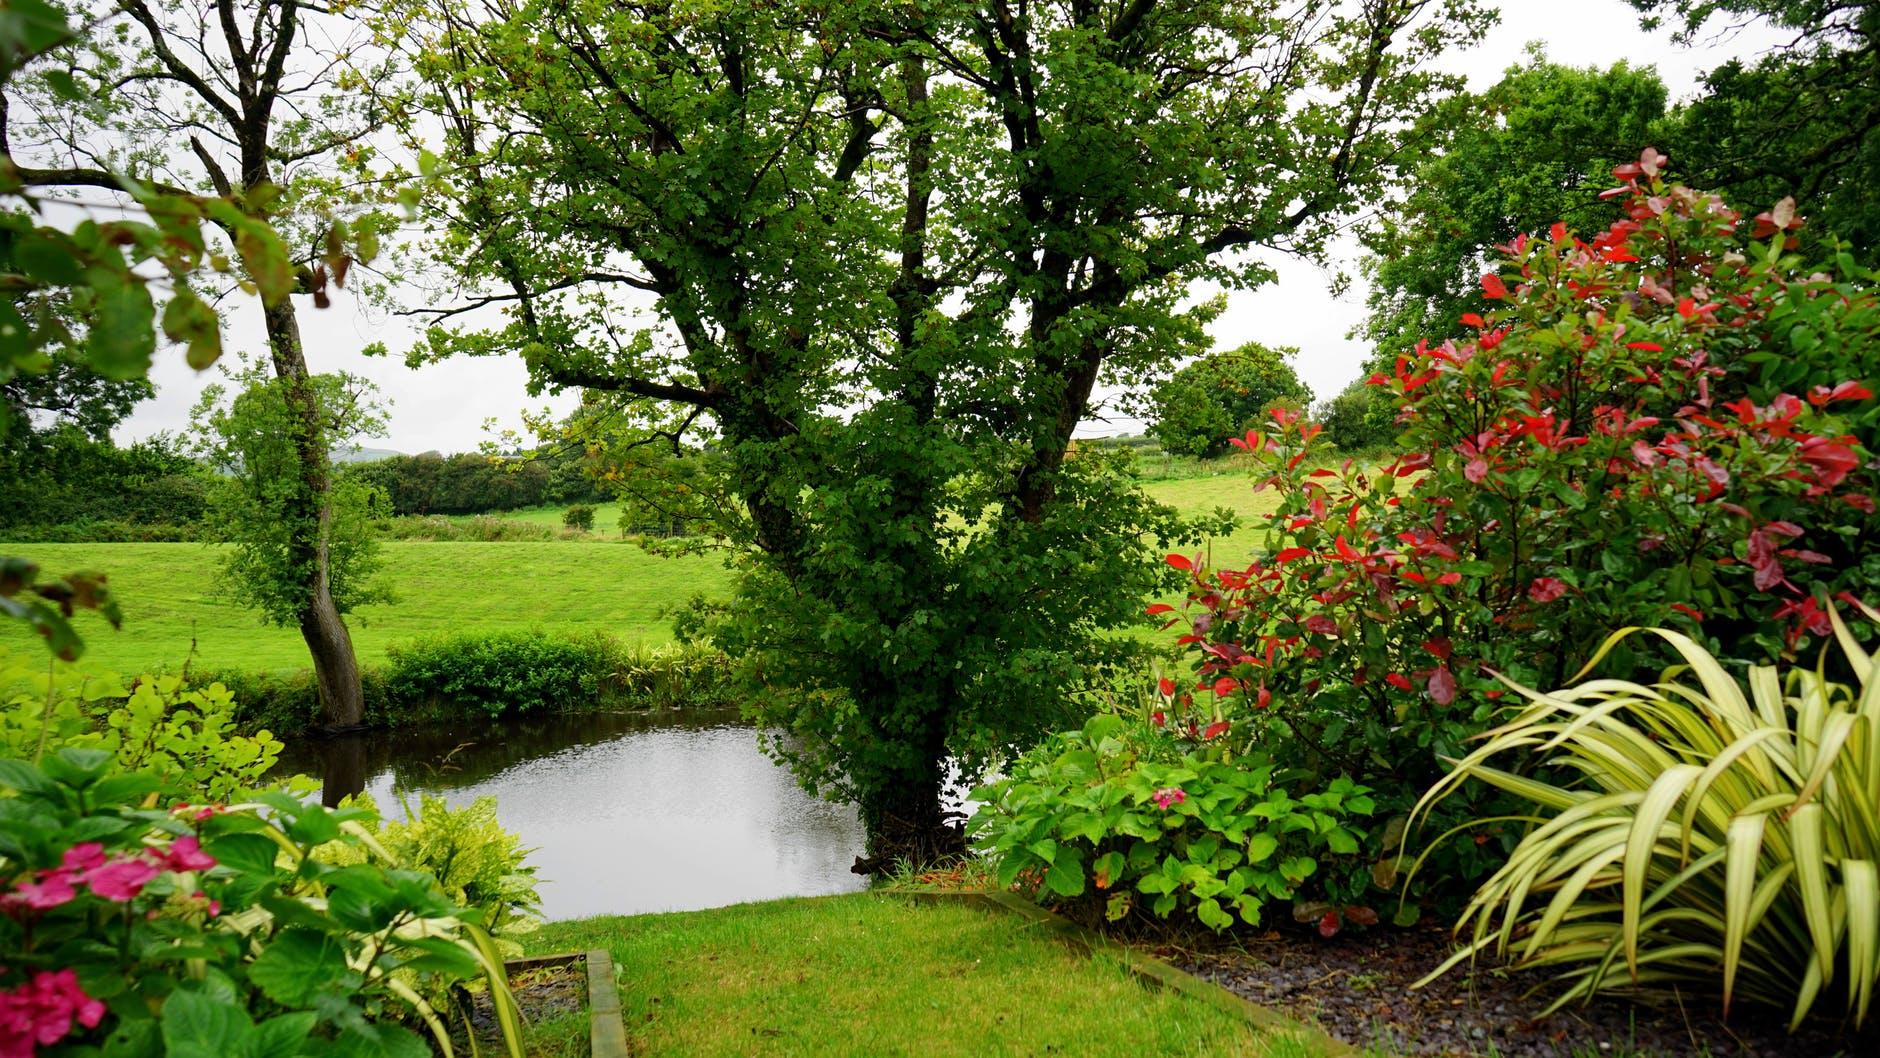 Op welke manier besproei je je tuin het fijnste?